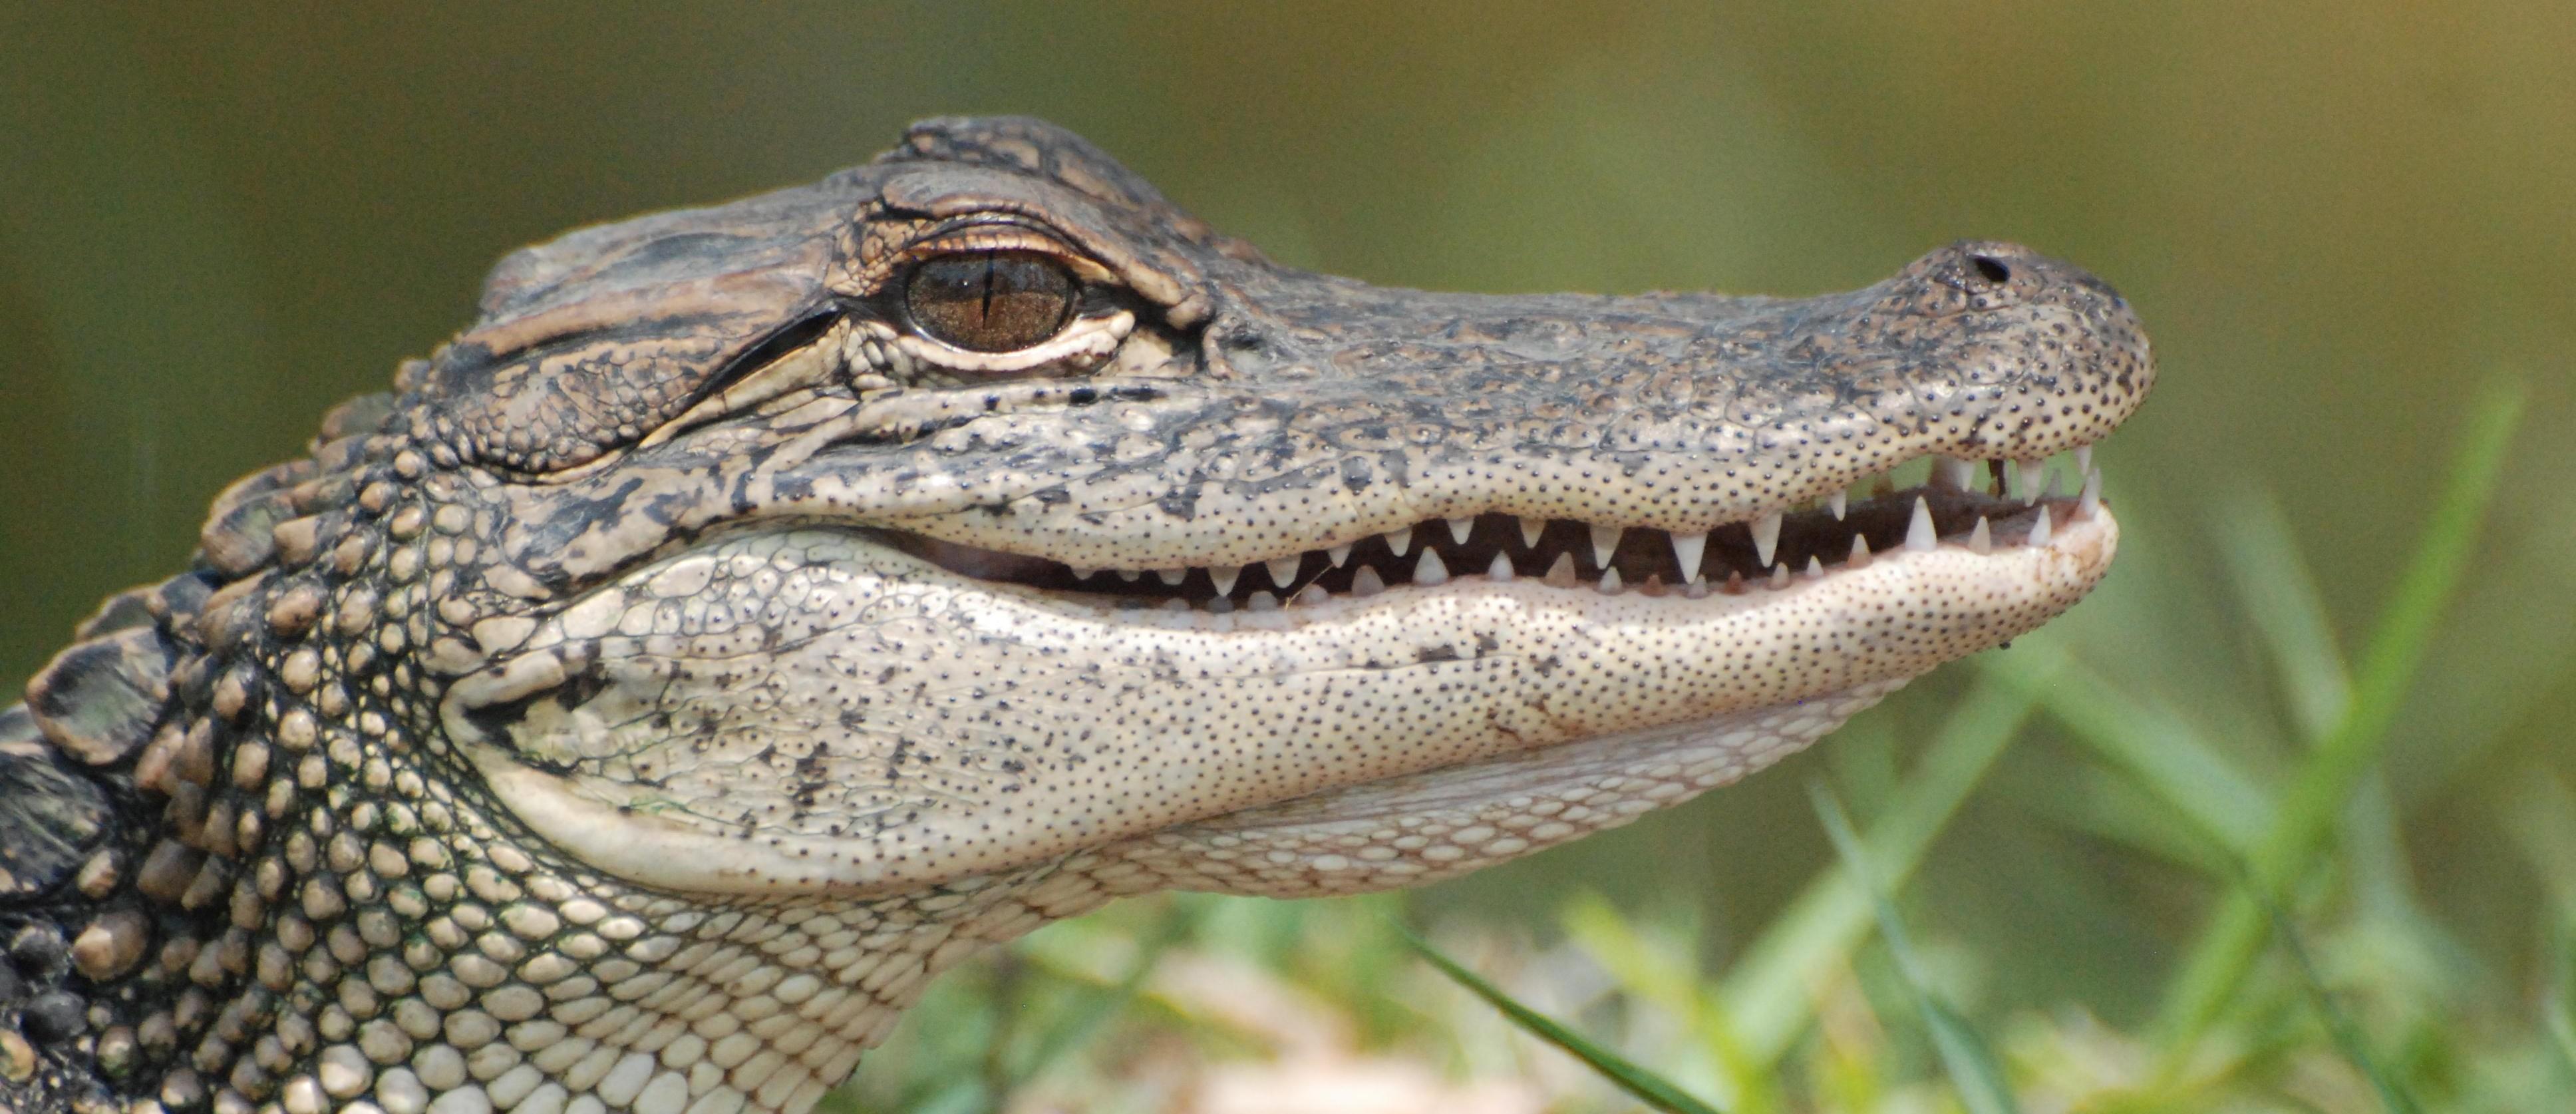 close up of alligator's head